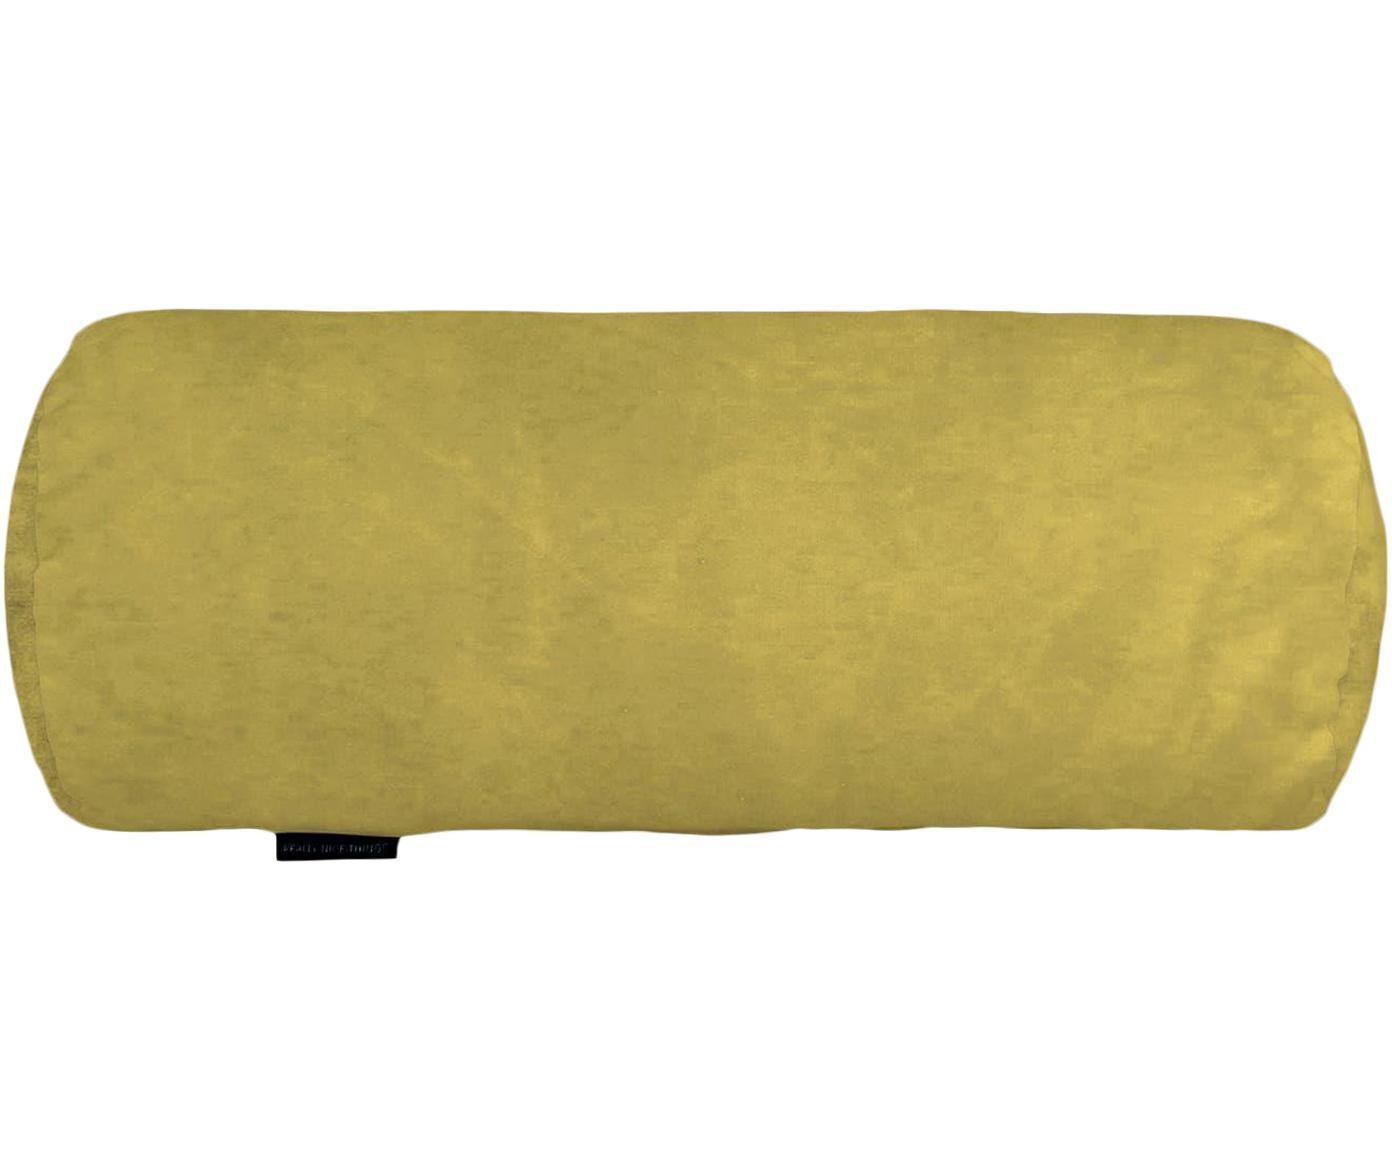 Cojín rulo Amarillo, Poliéster, Mostaza, Ø 20 x L 50 cm